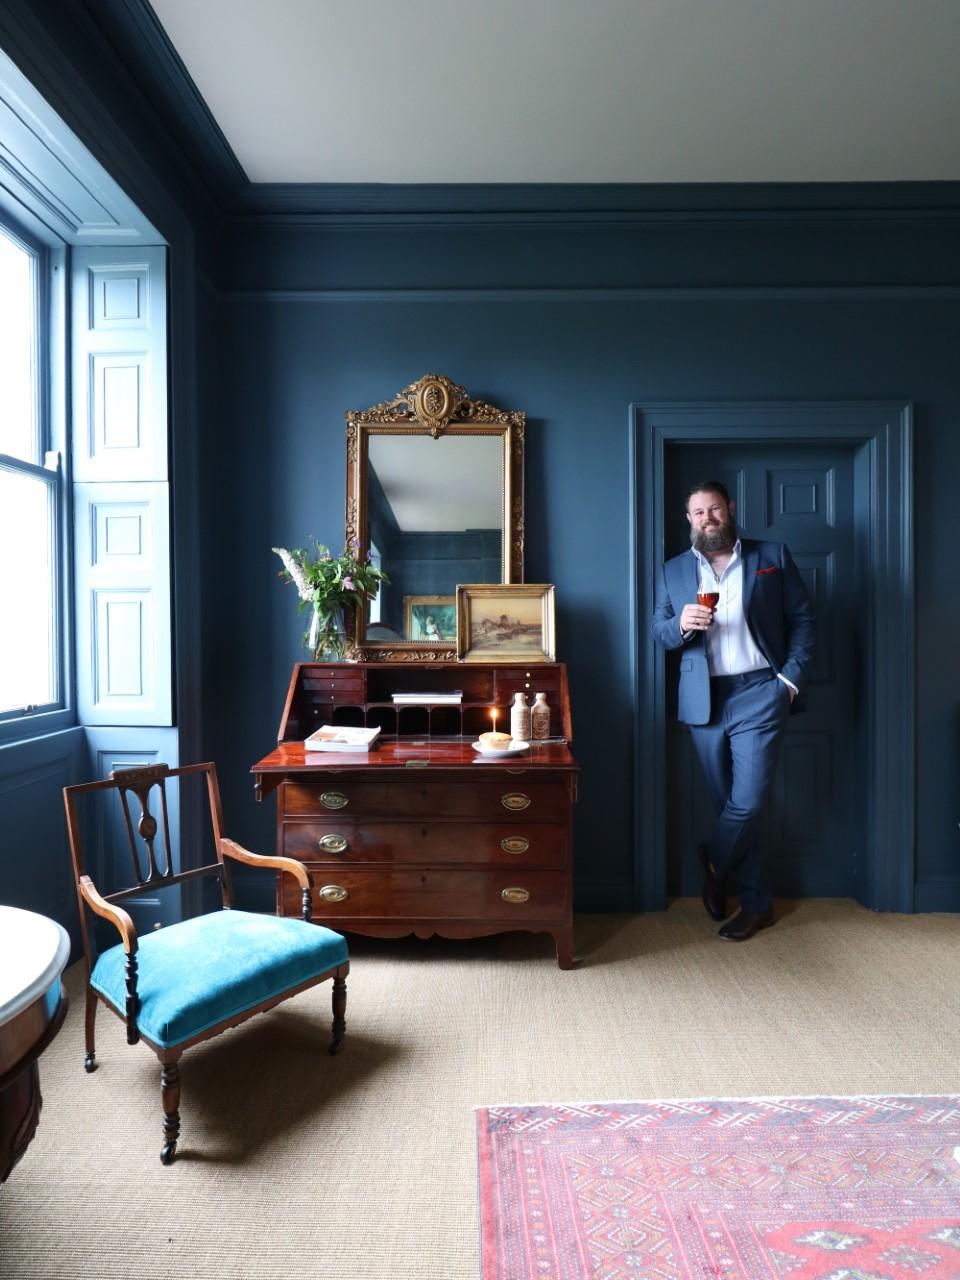 blue bedroom living room drawing room sisal bureau antique furnitire interior design manwithahammer